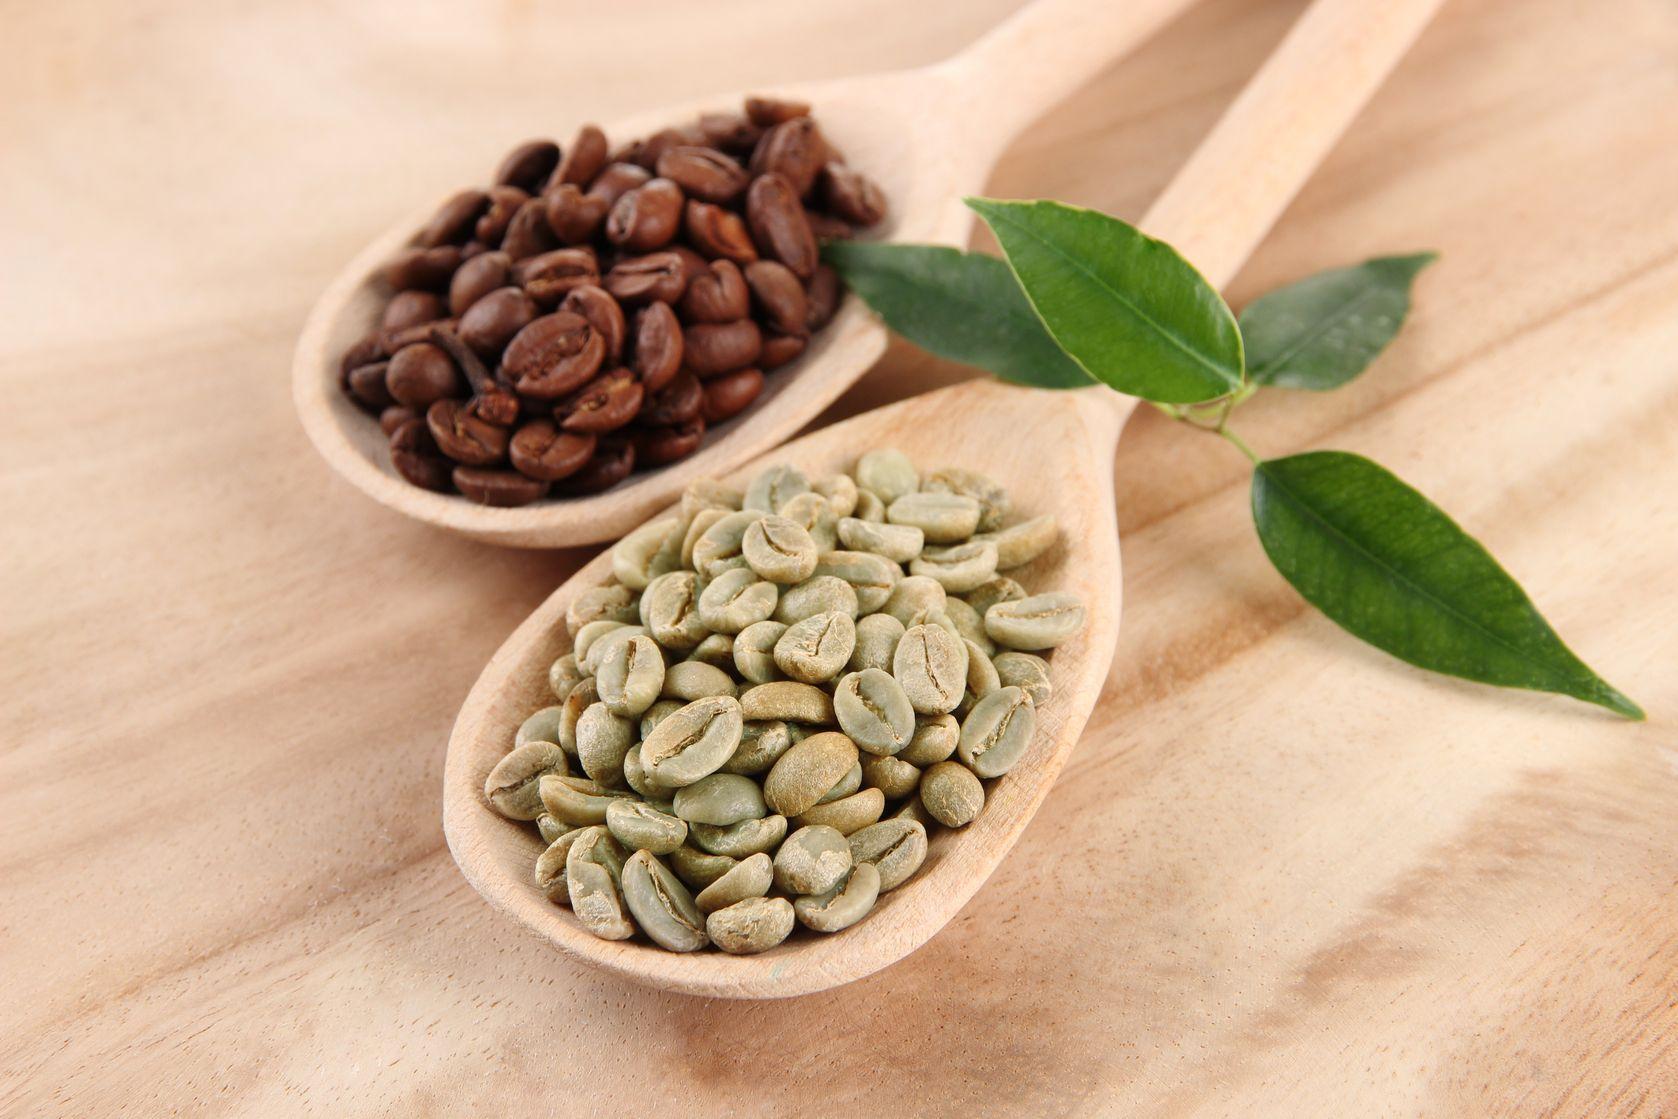 Il caffè verde contiene caffeina?